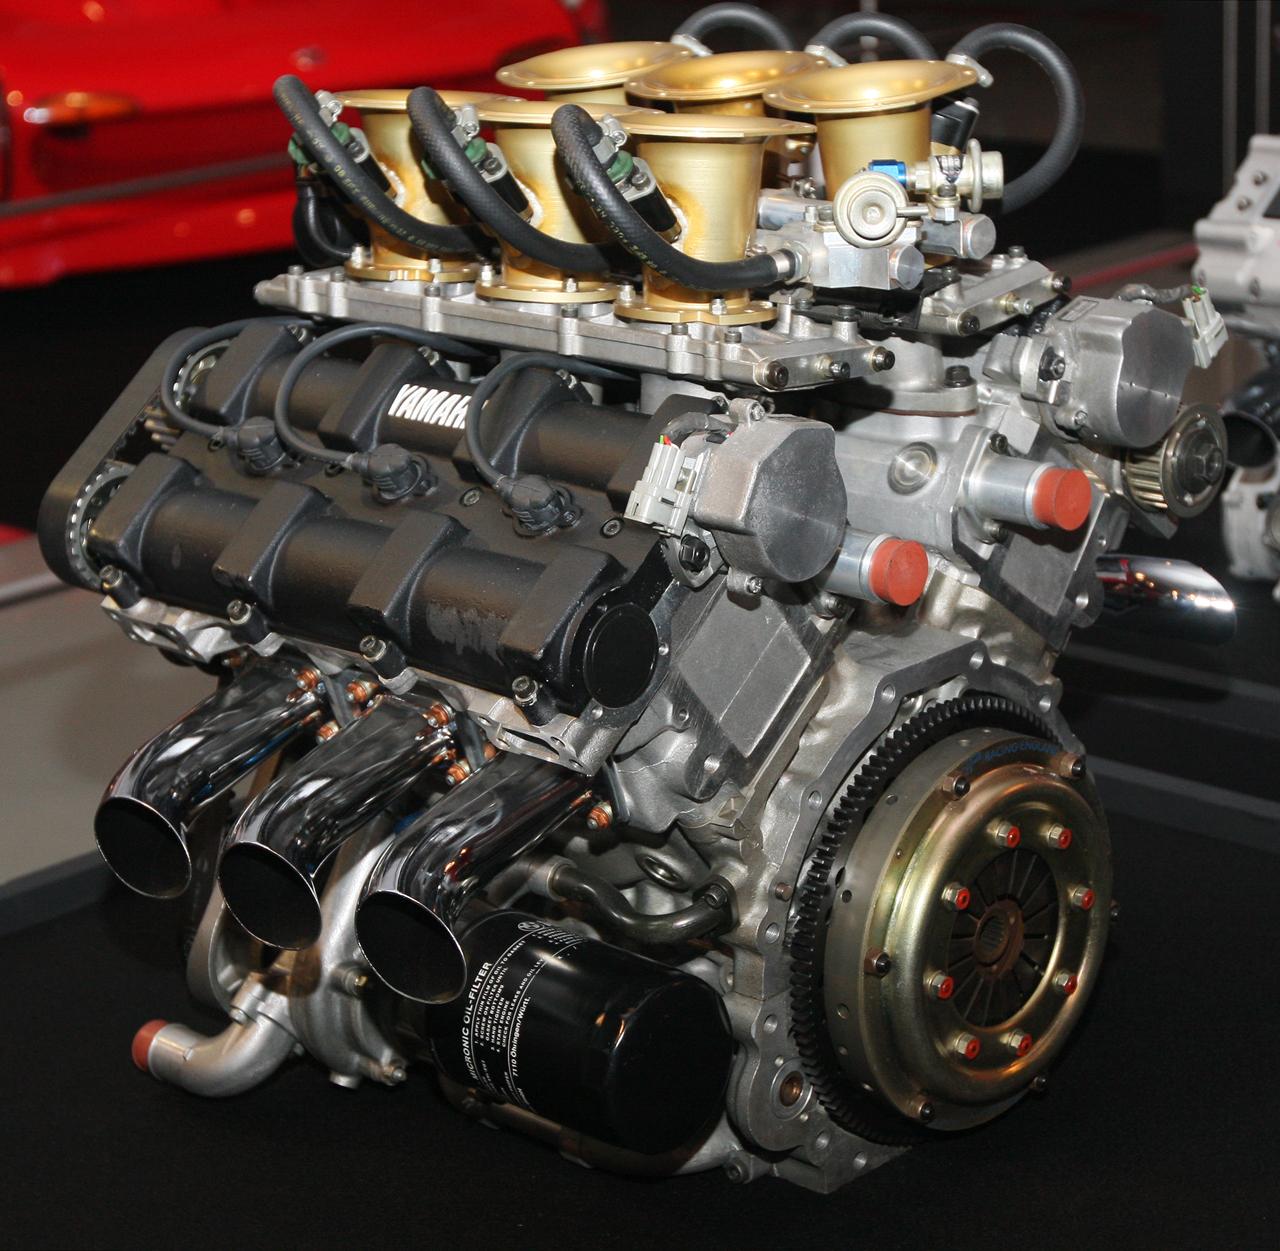 File:Yamaha OX66 engine rear jpg - Wikimedia Commons